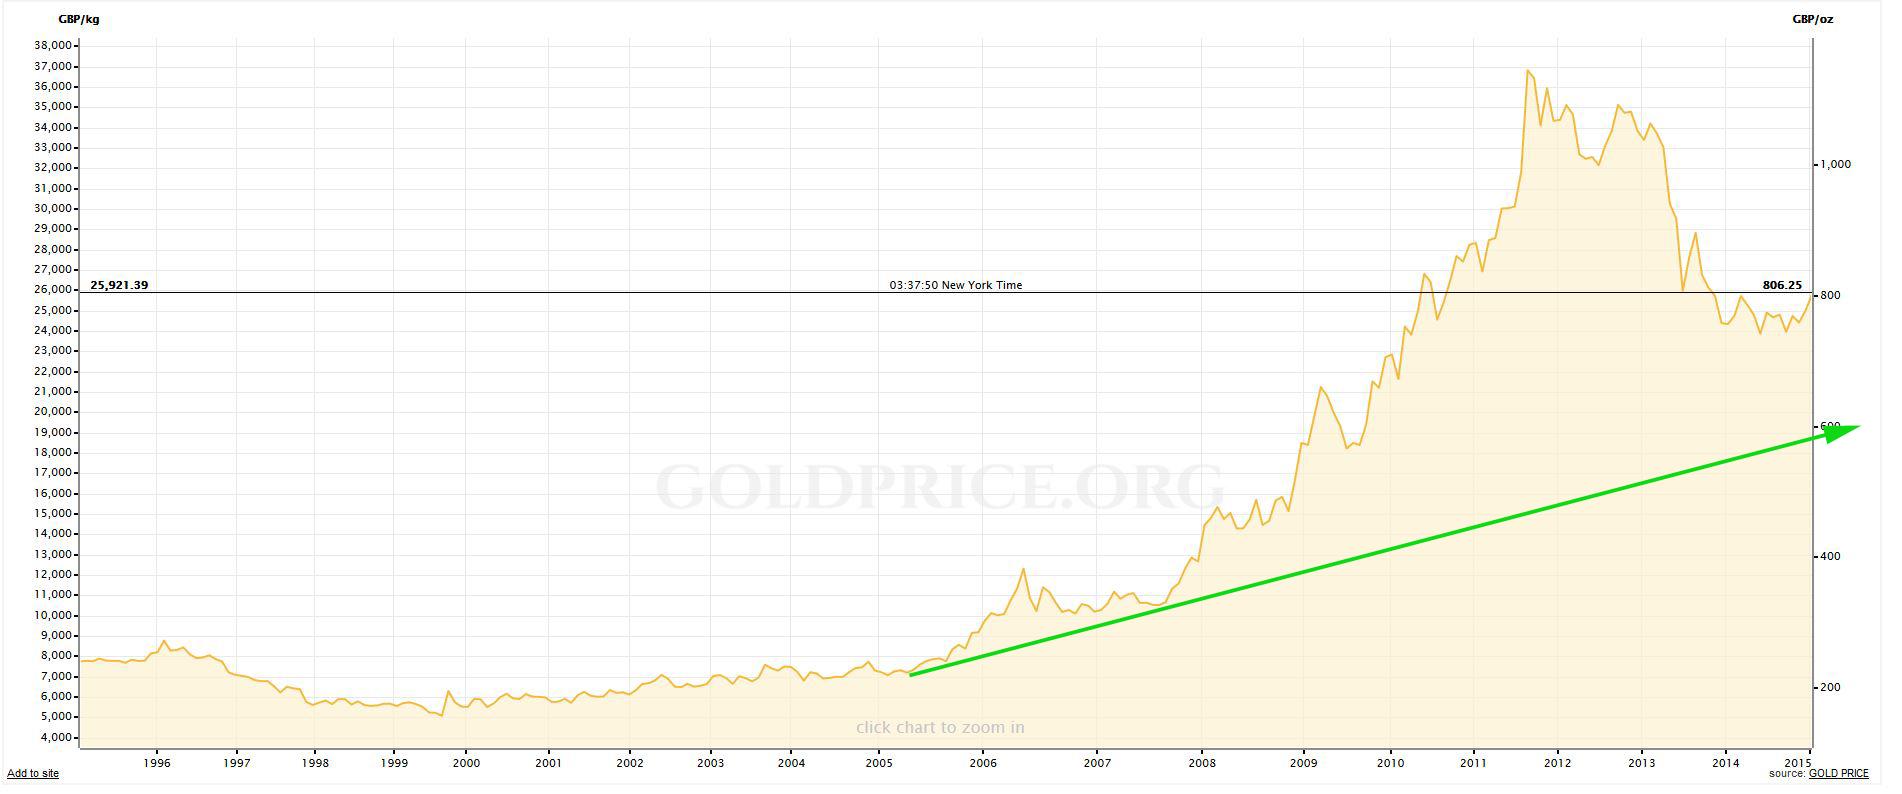 GOLD GBP